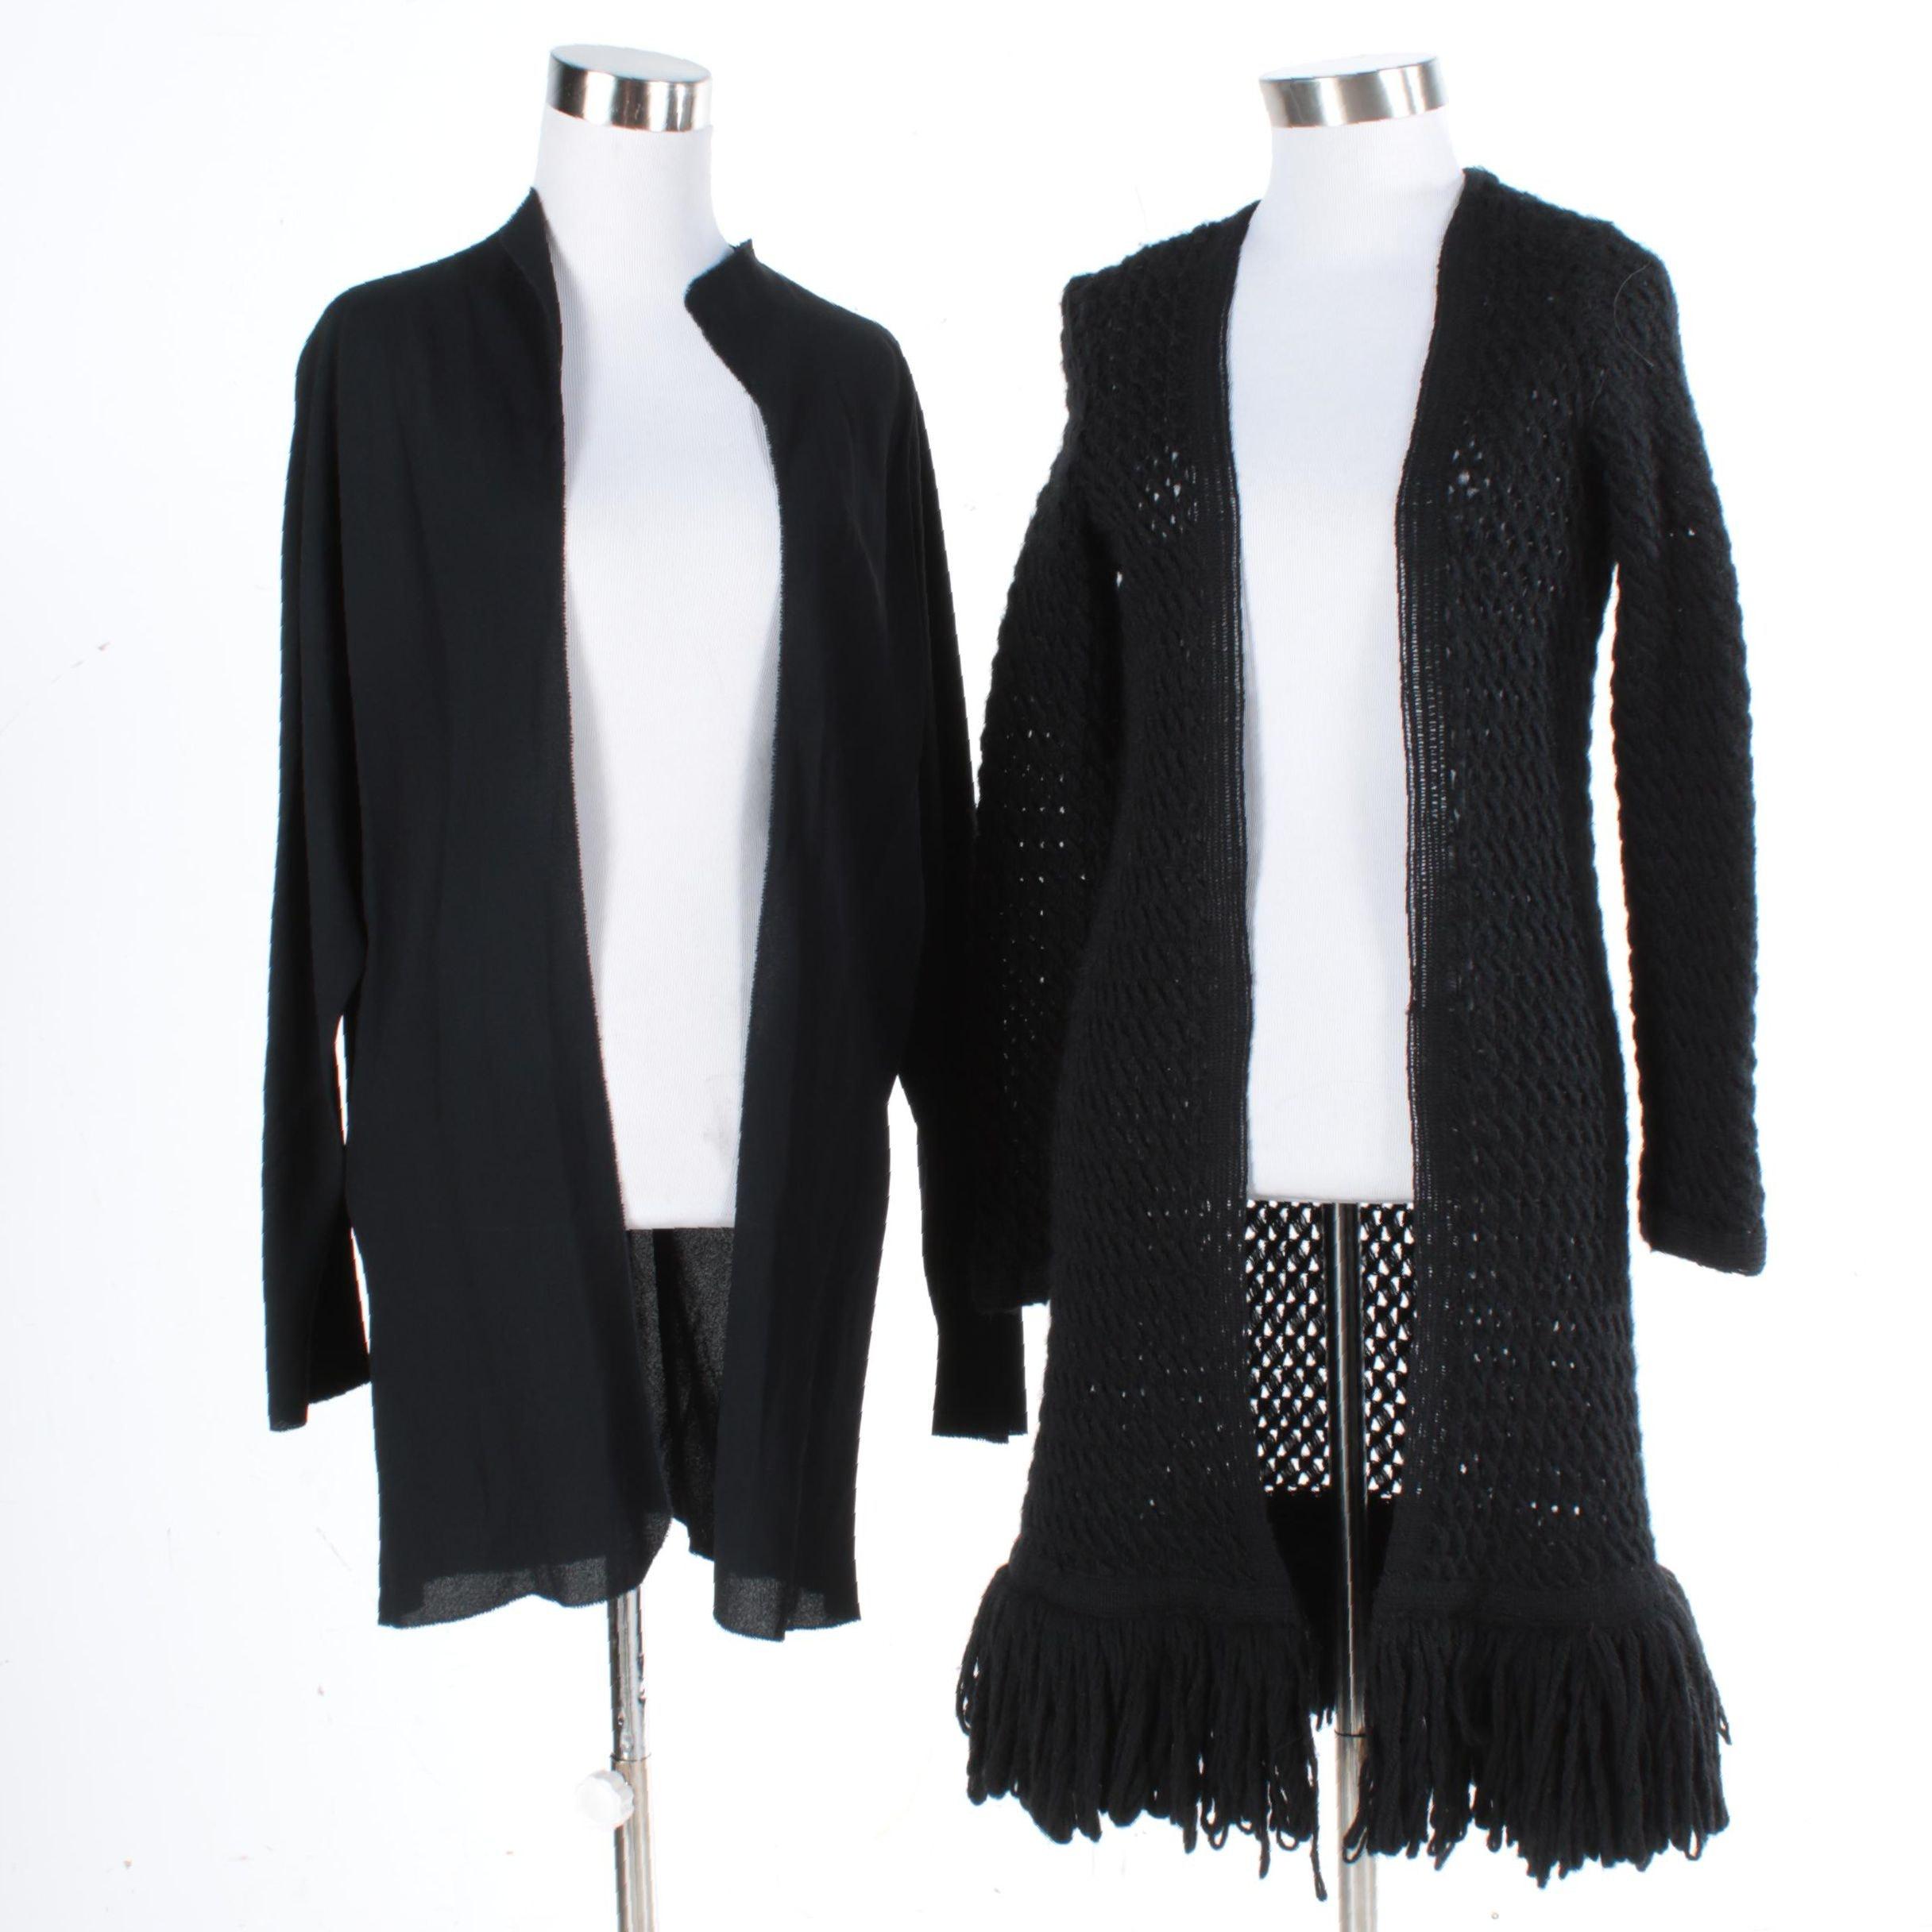 Women's Sweater Coats Including 1974 Jackie Rogers Crochet Coat